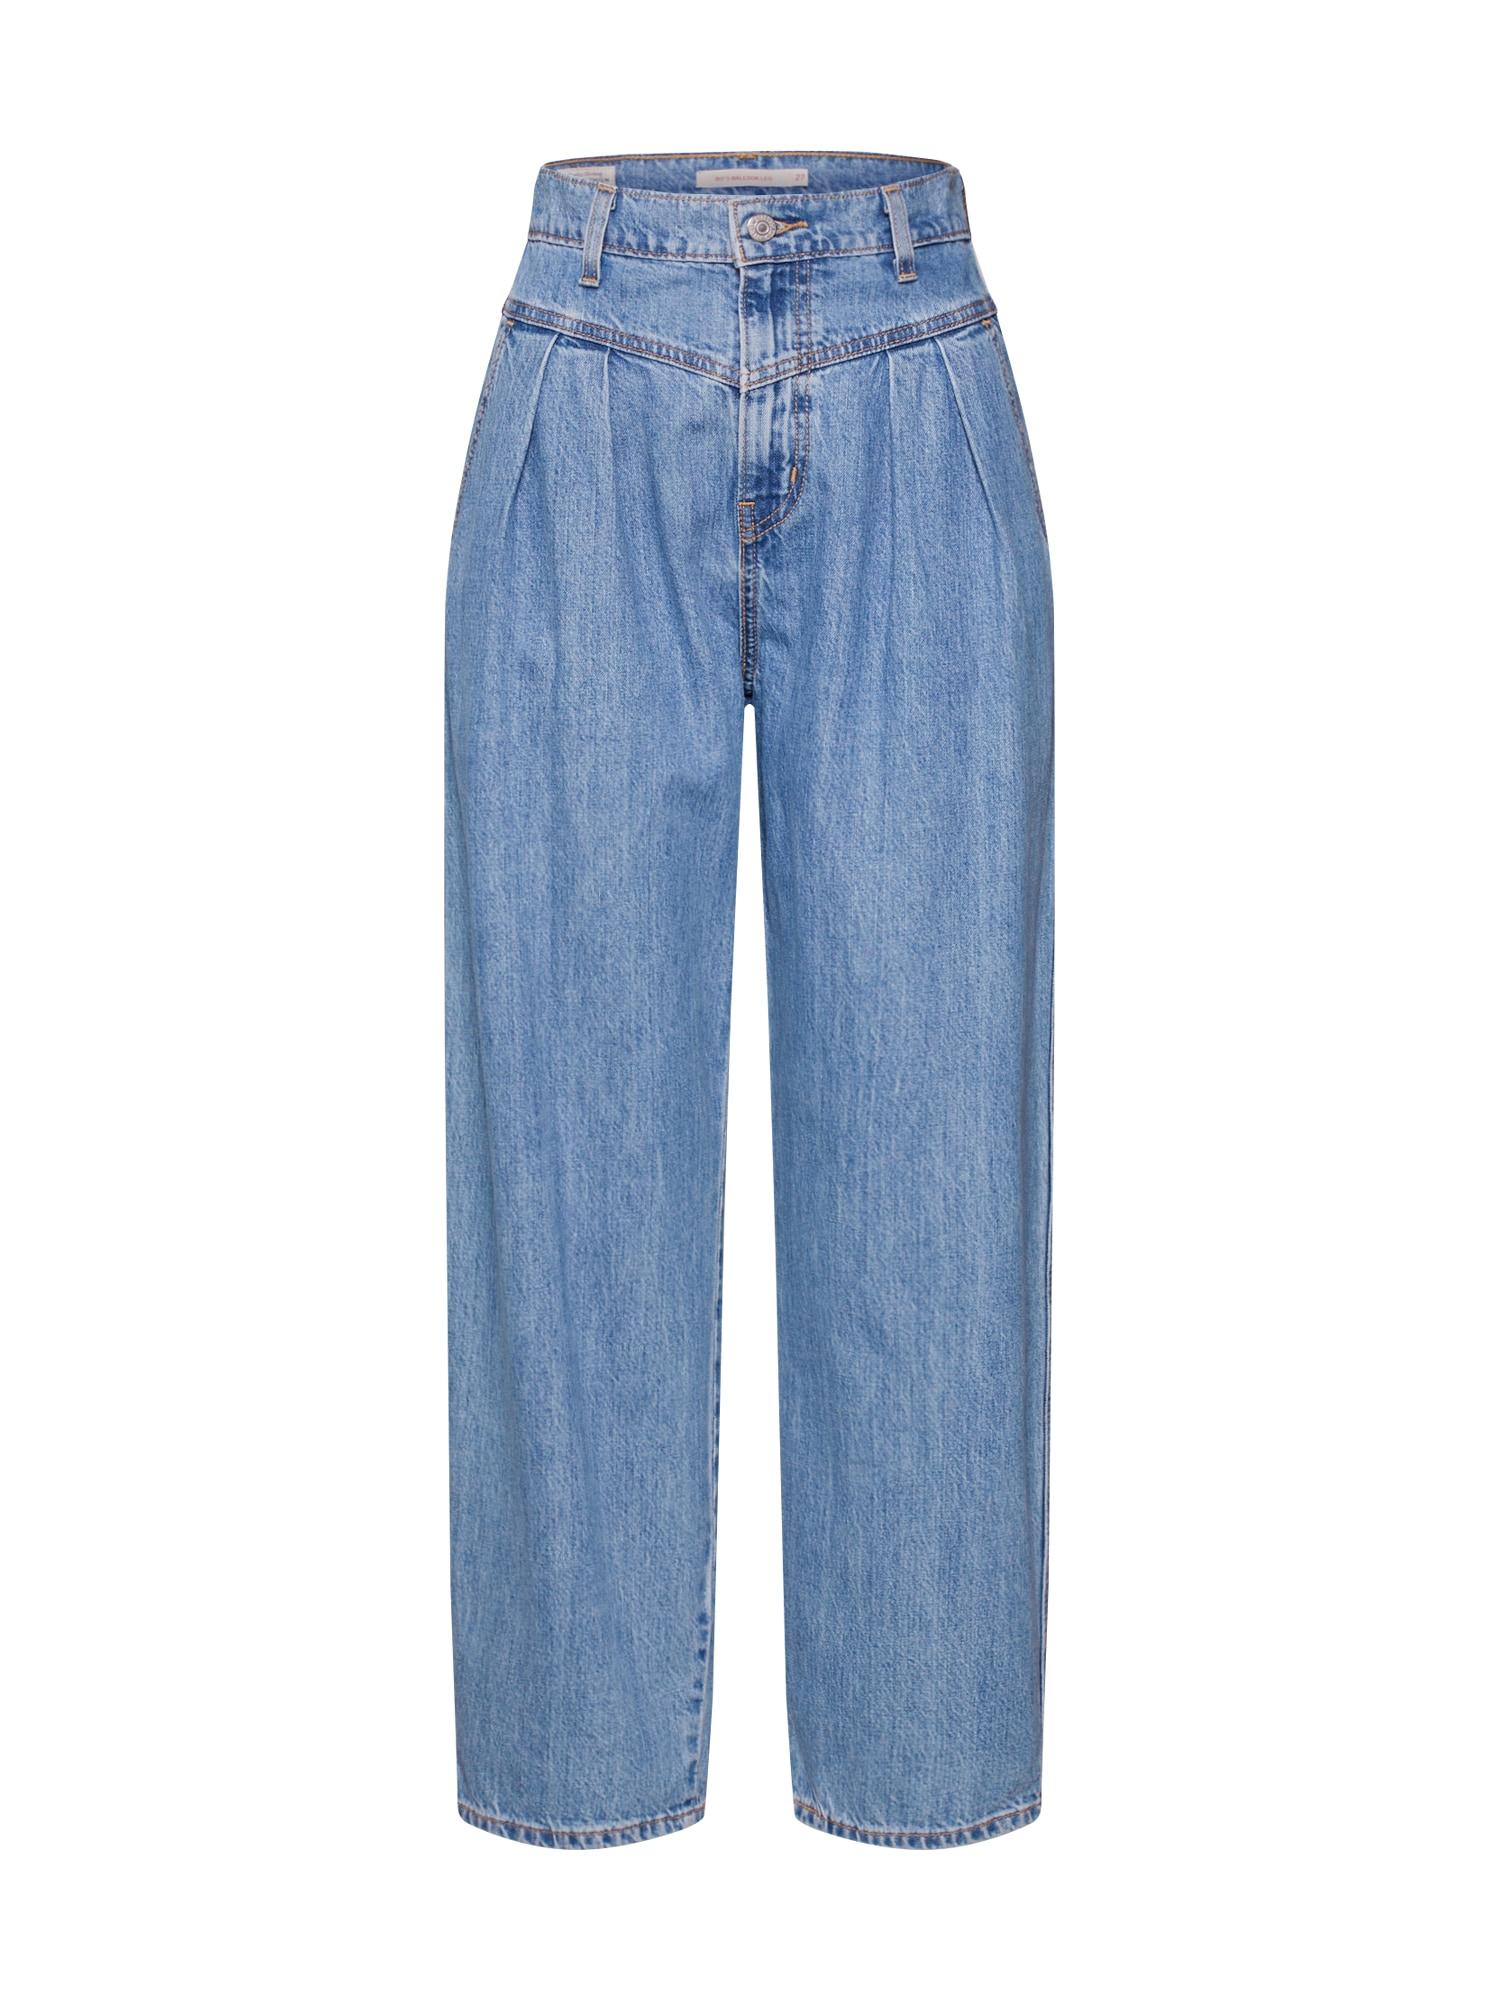 LEVI'S Džinsai '80's BALLOON LEG' tamsiai (džinso) mėlyna